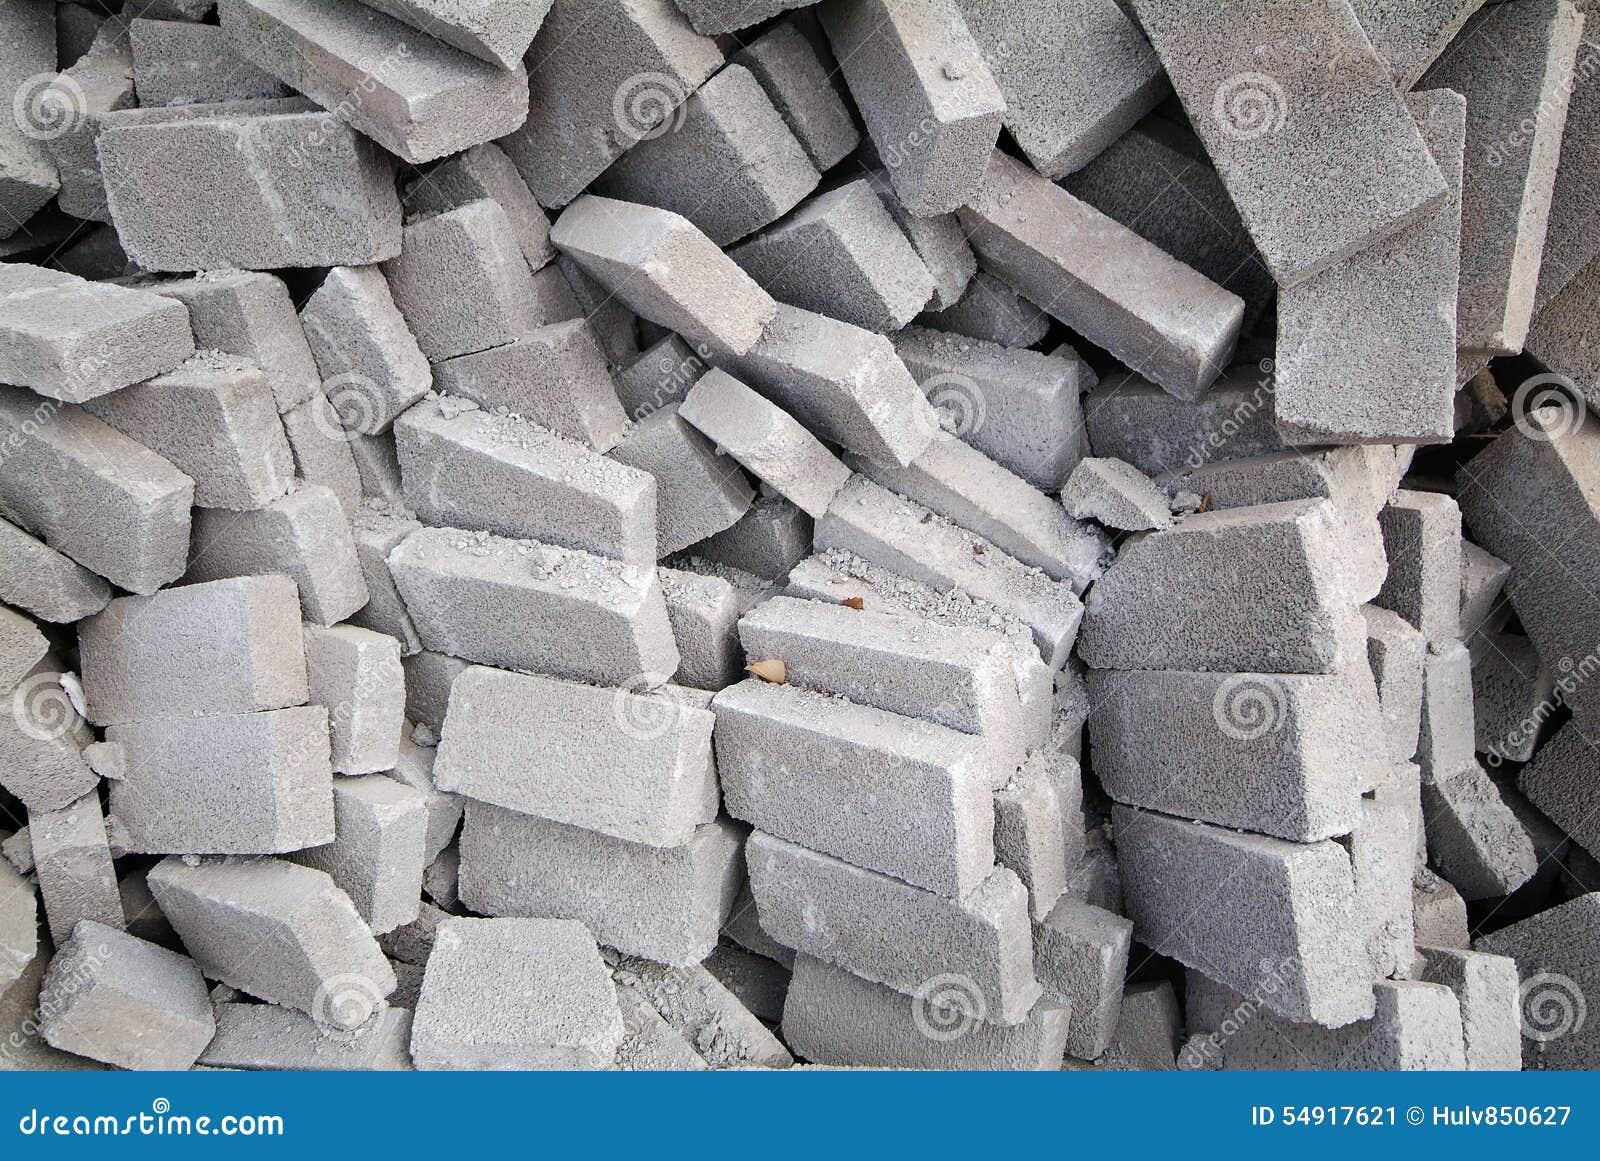 Calcium Silicate Brick Chipped : Big pile of bricks stock photo image